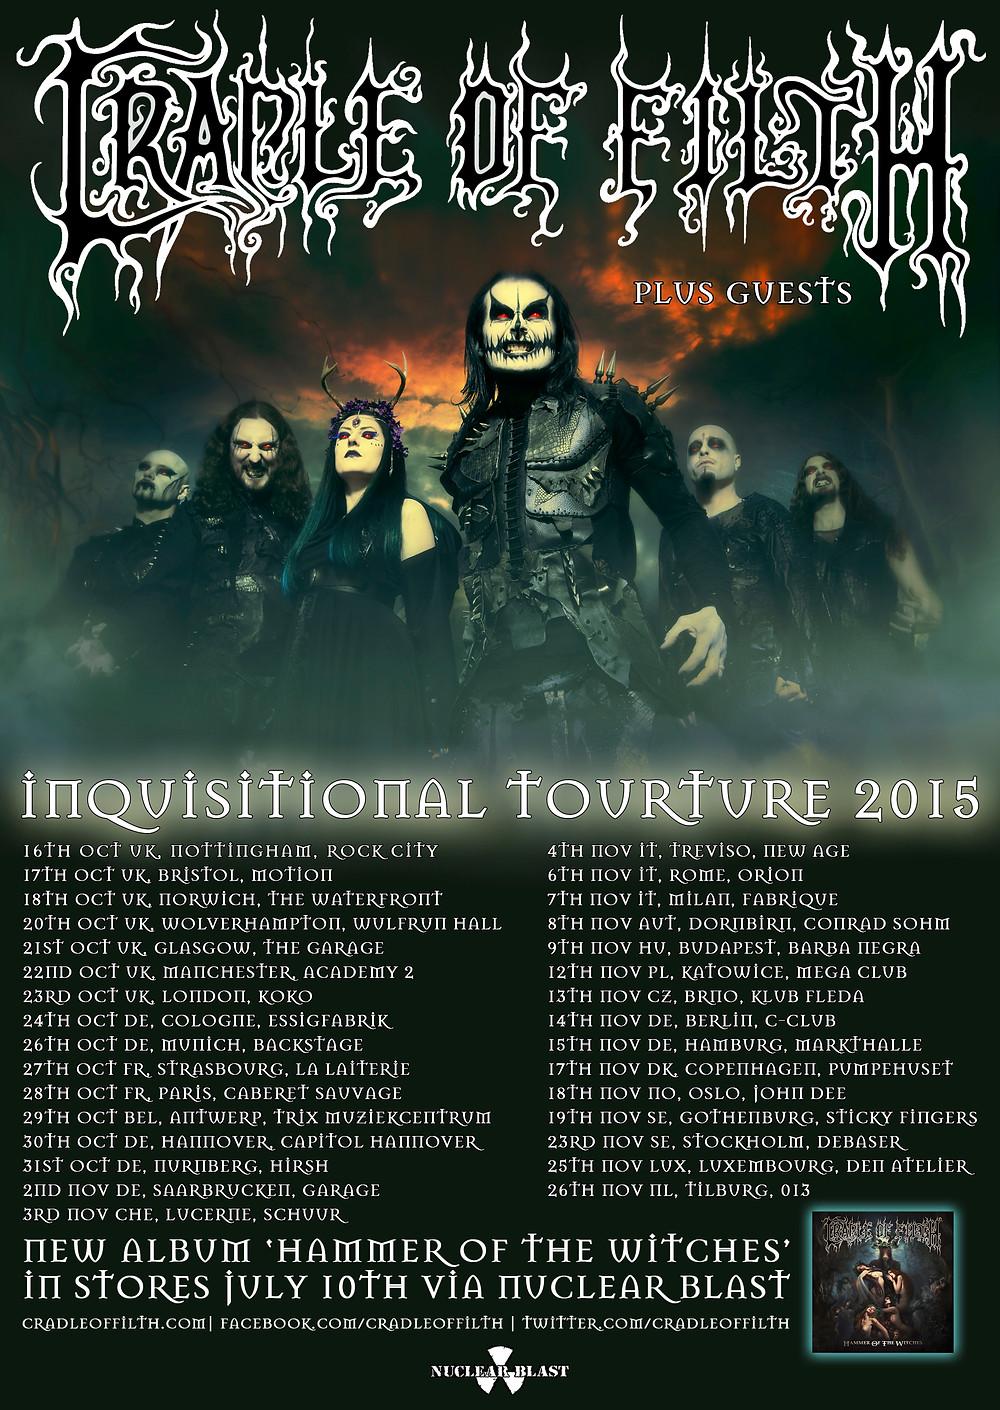 COF_EU + UK Tour Poster_with TILBURG + LUXEMBOURG copy.jpg